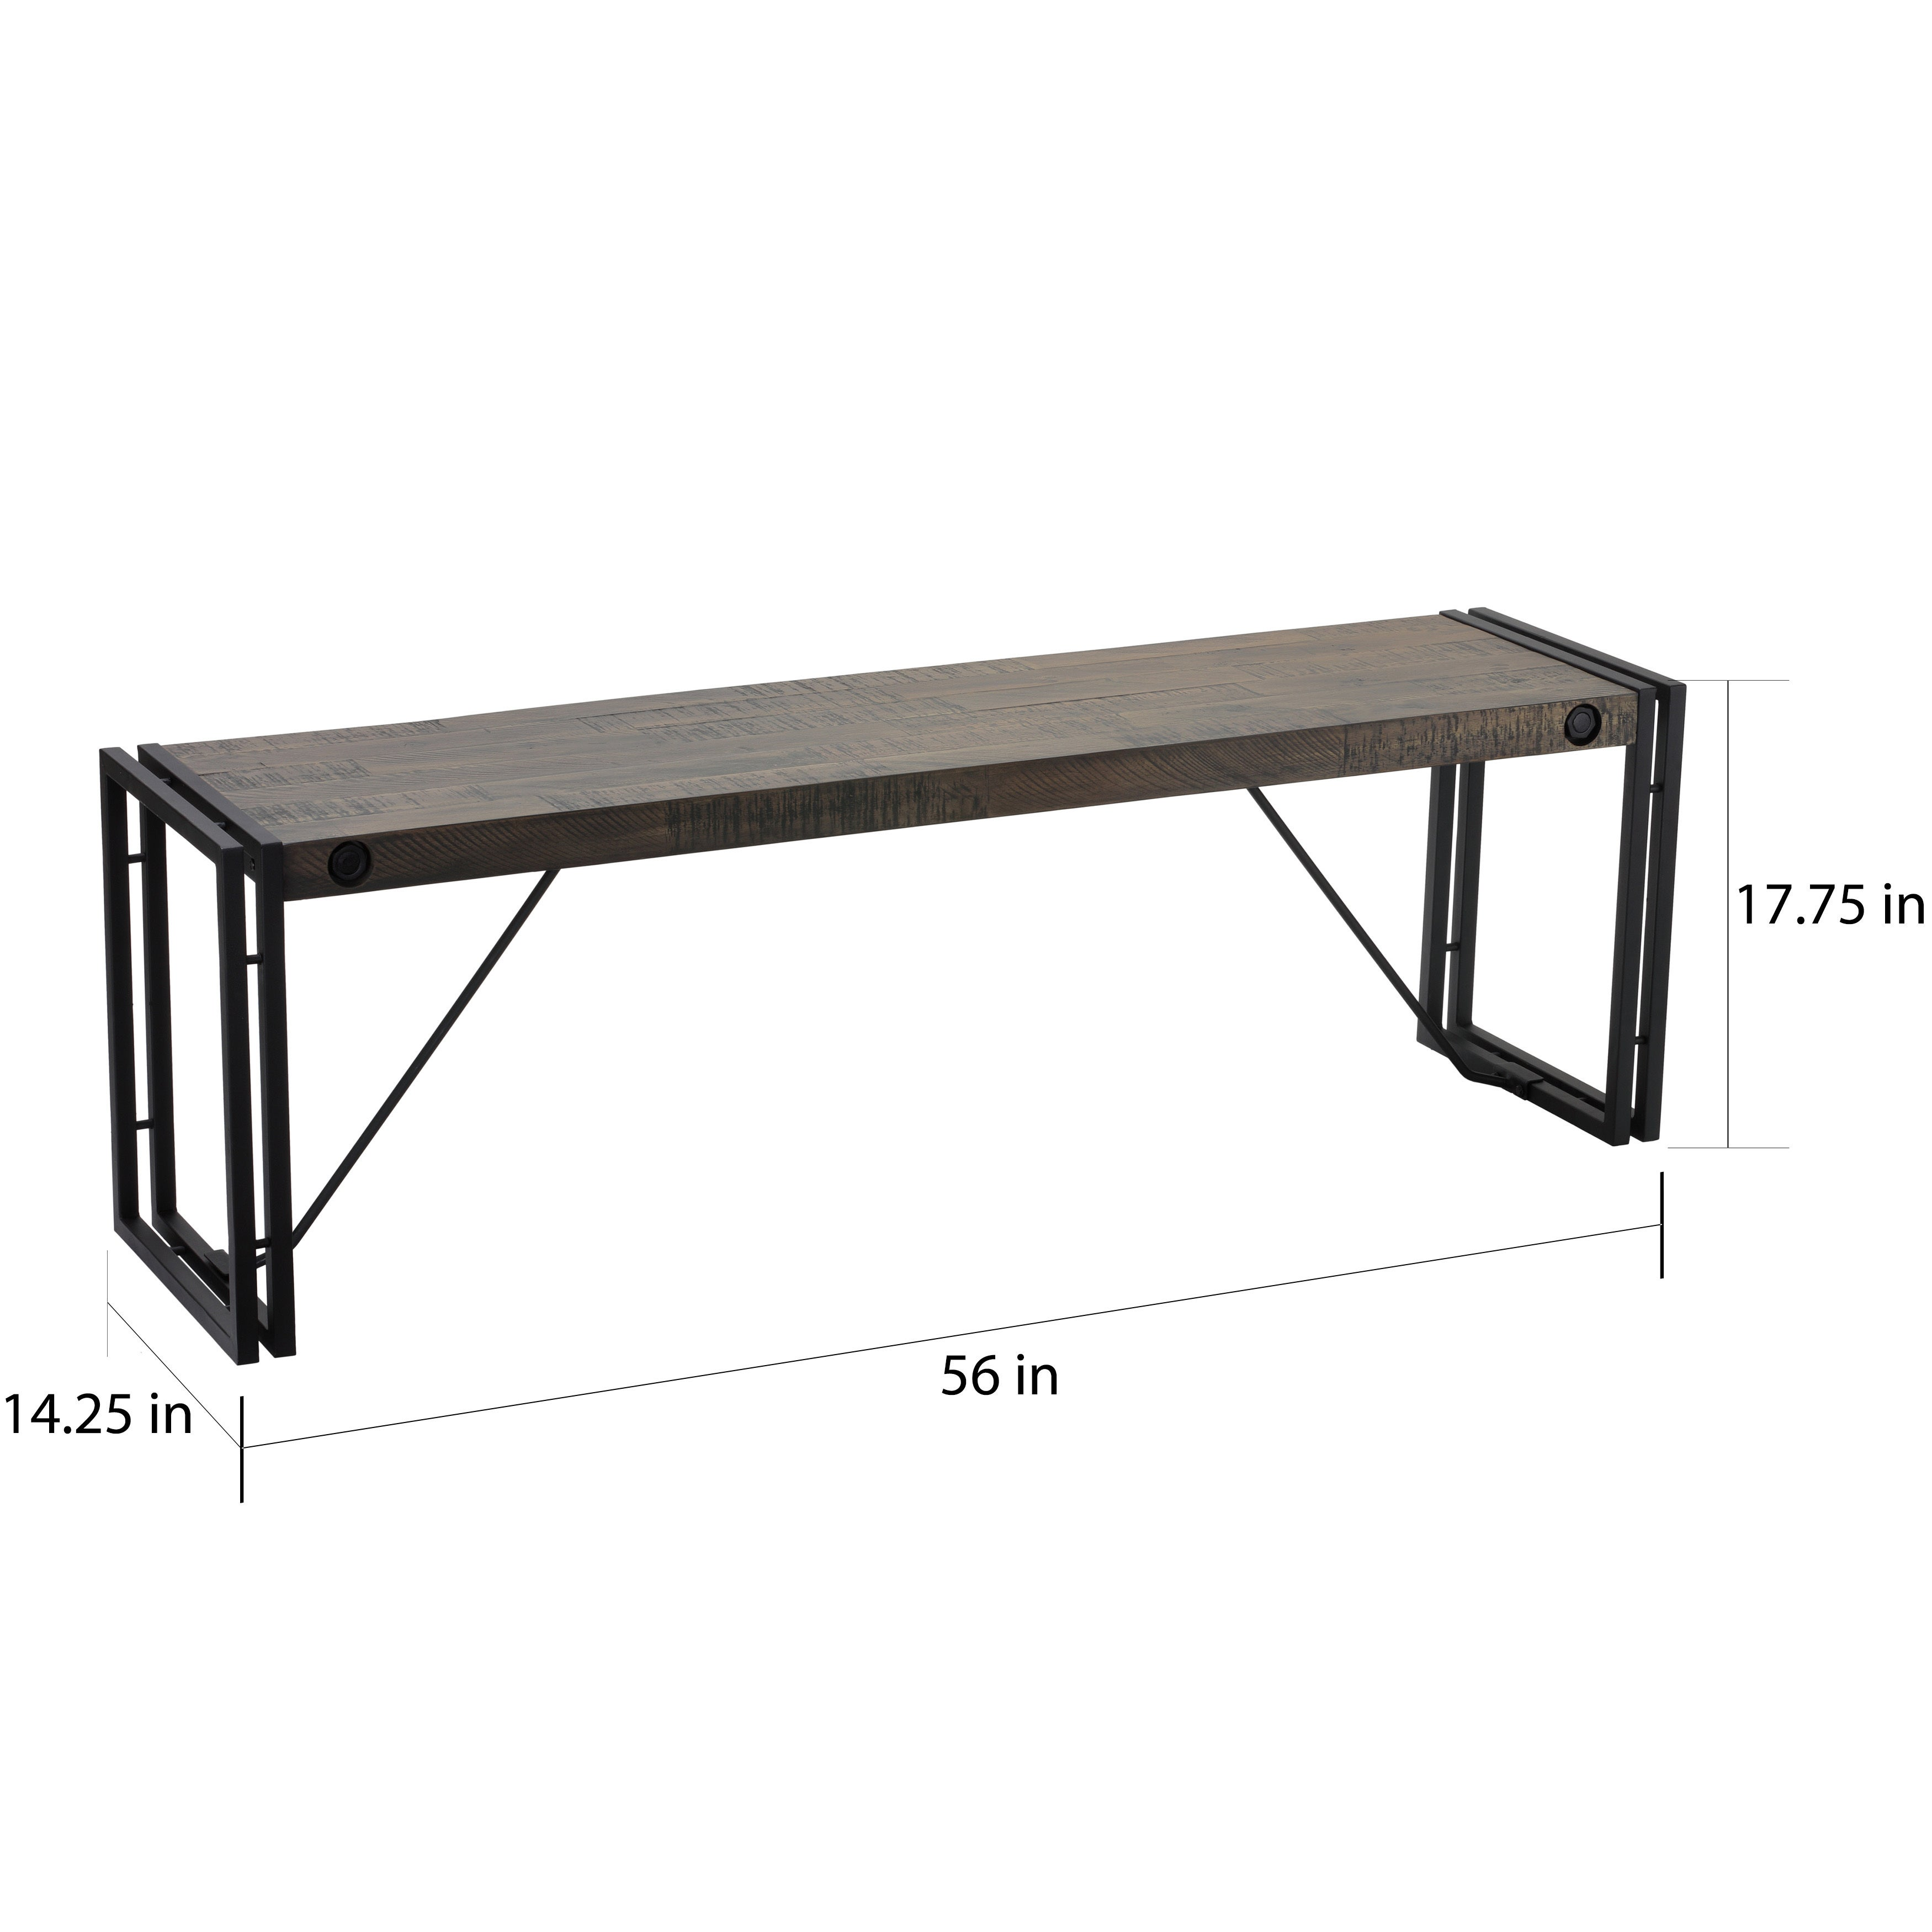 Shop Carbon Loft Edelman Black/Grey Driftwood Bench with Metal Frame ...